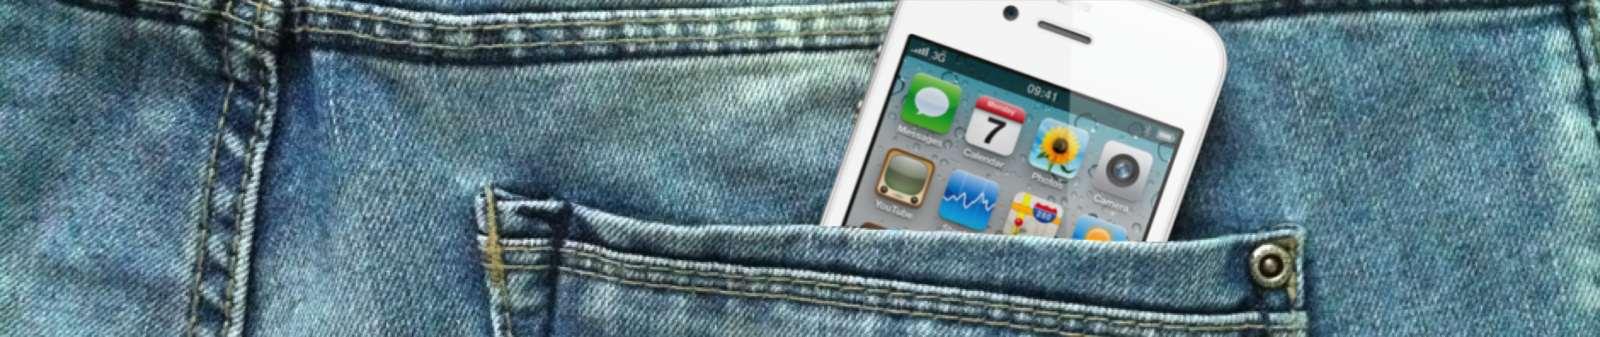 iPhone v kapse